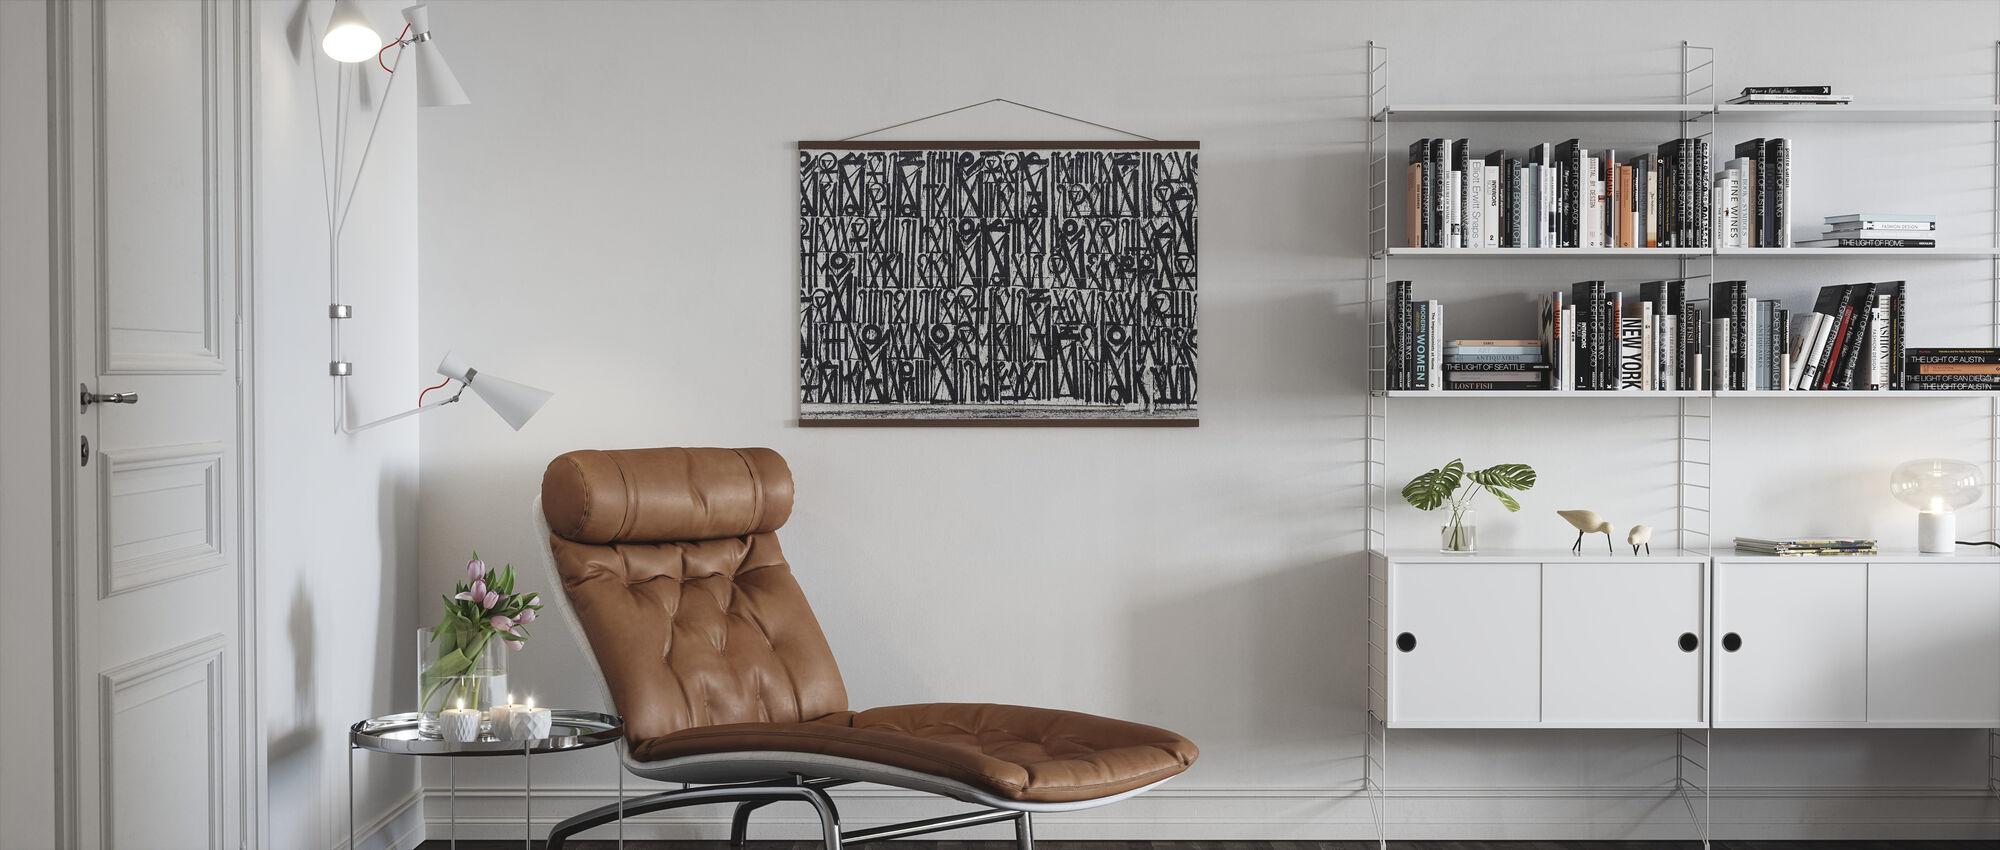 Abstract Graffiti - Poster - Living Room